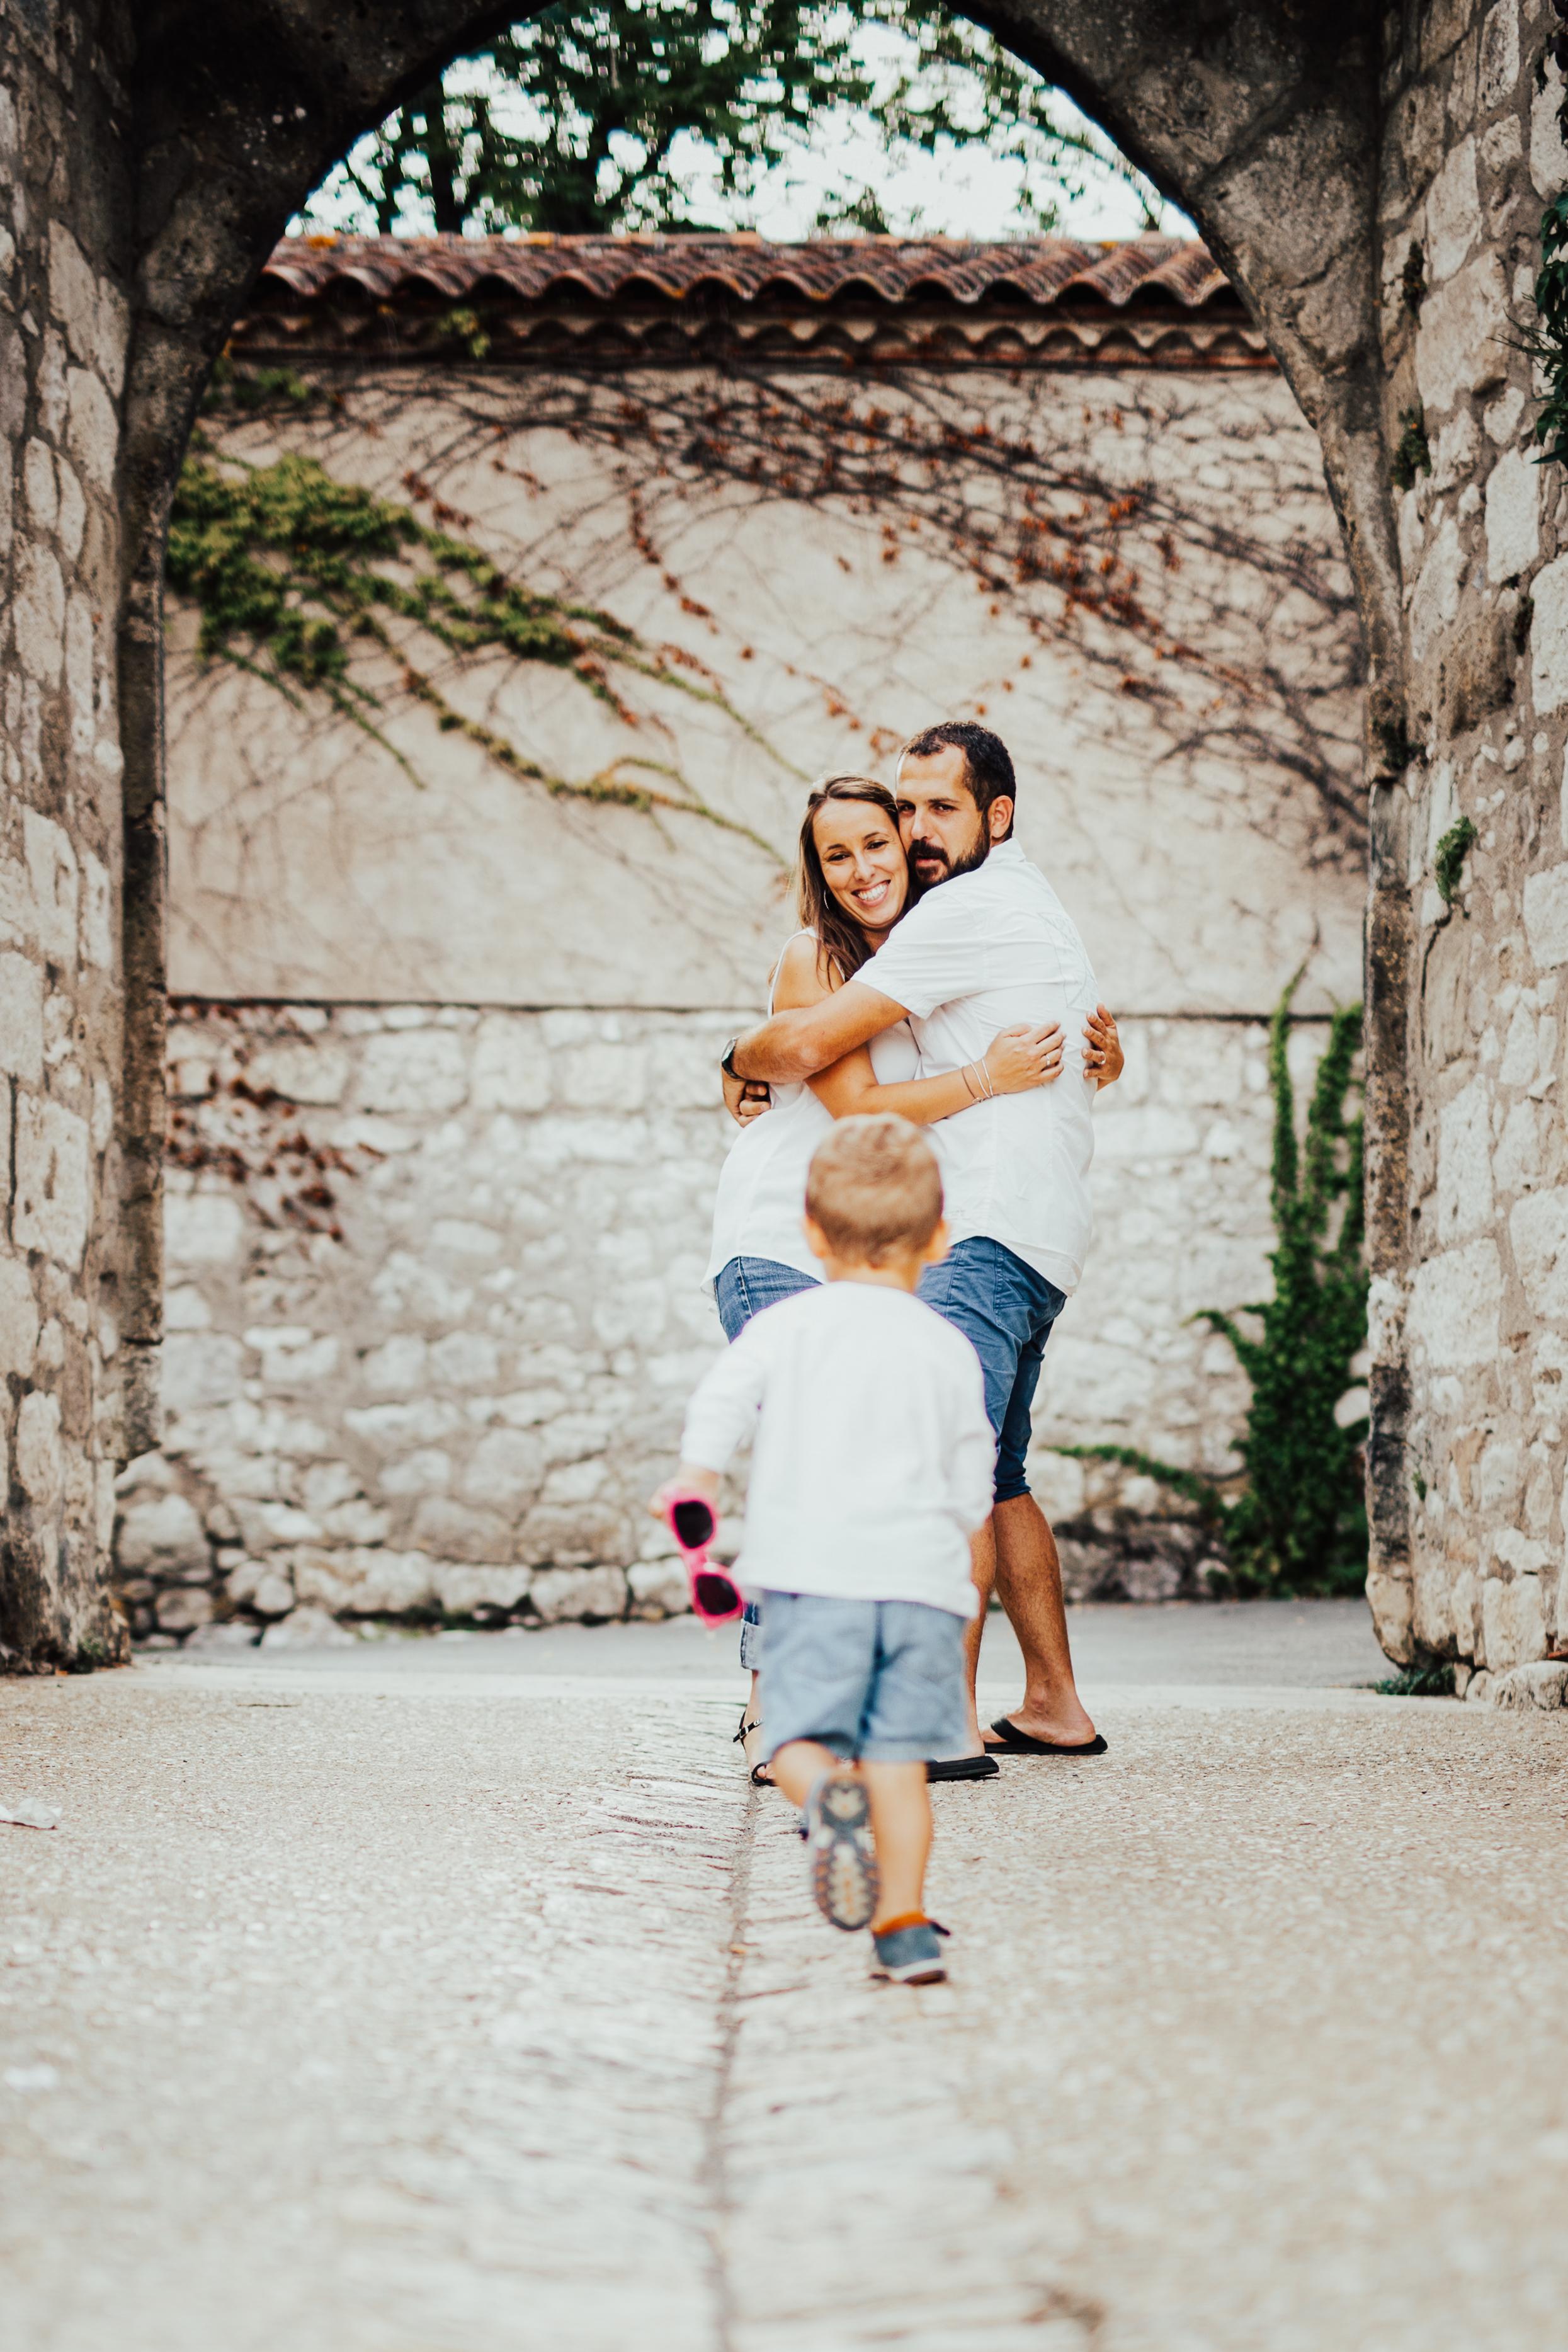 Photographe famille grossesse bébé shooting lifestyle bordeaux gironde guadeloupe famille